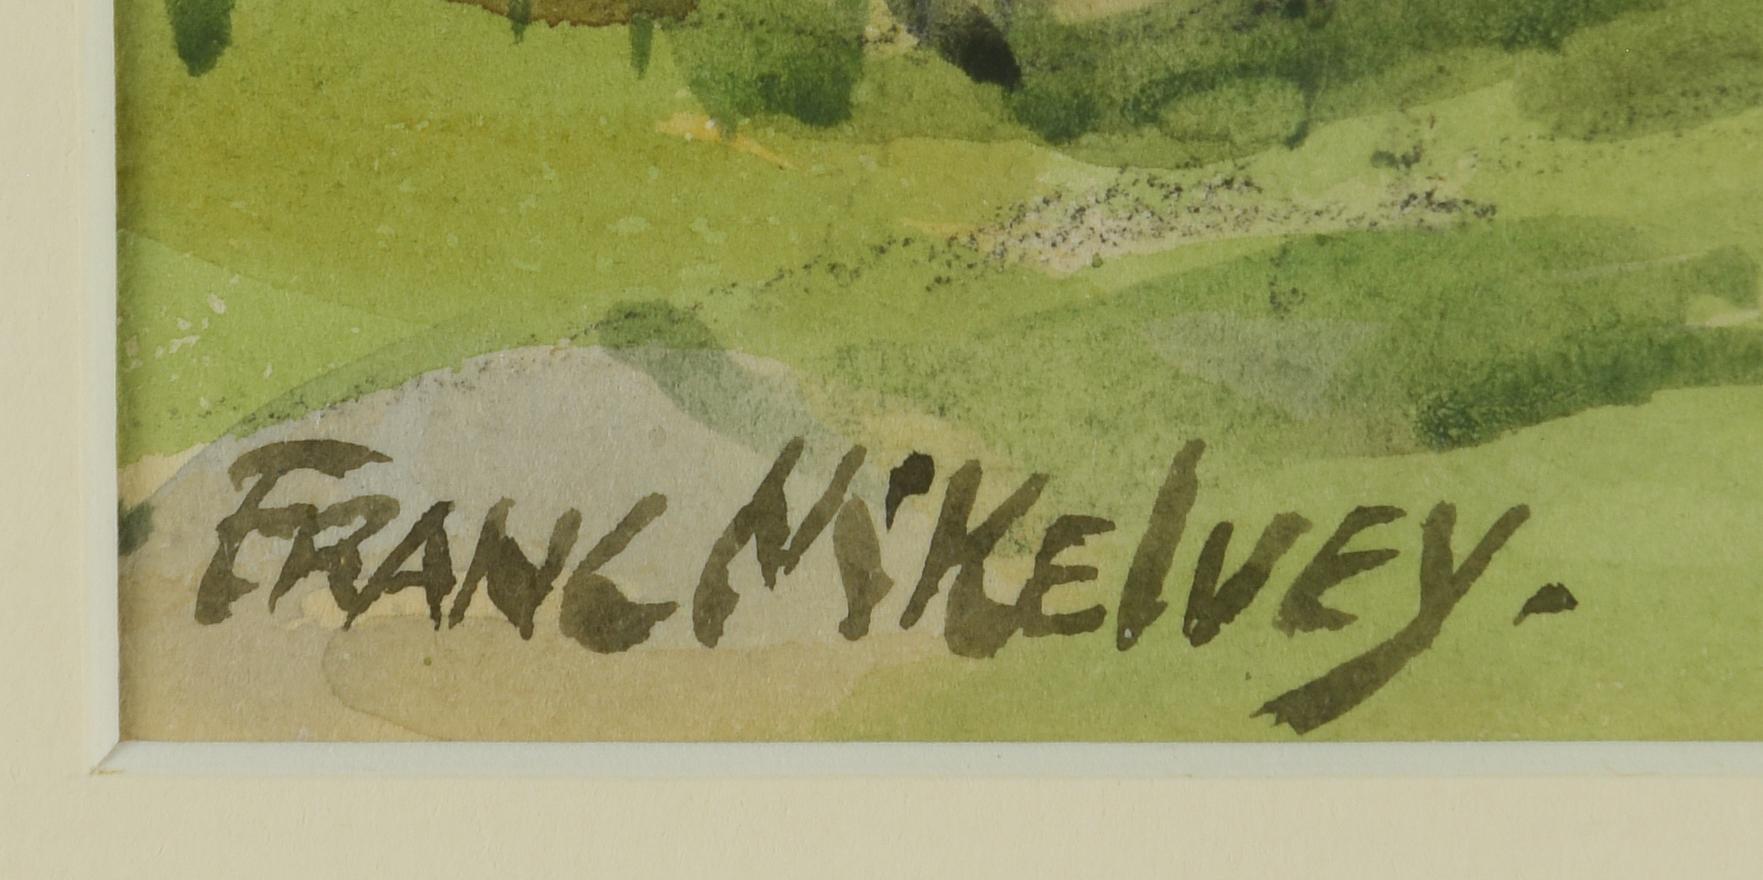 Lot 429: Frank McKelvey Watercolor